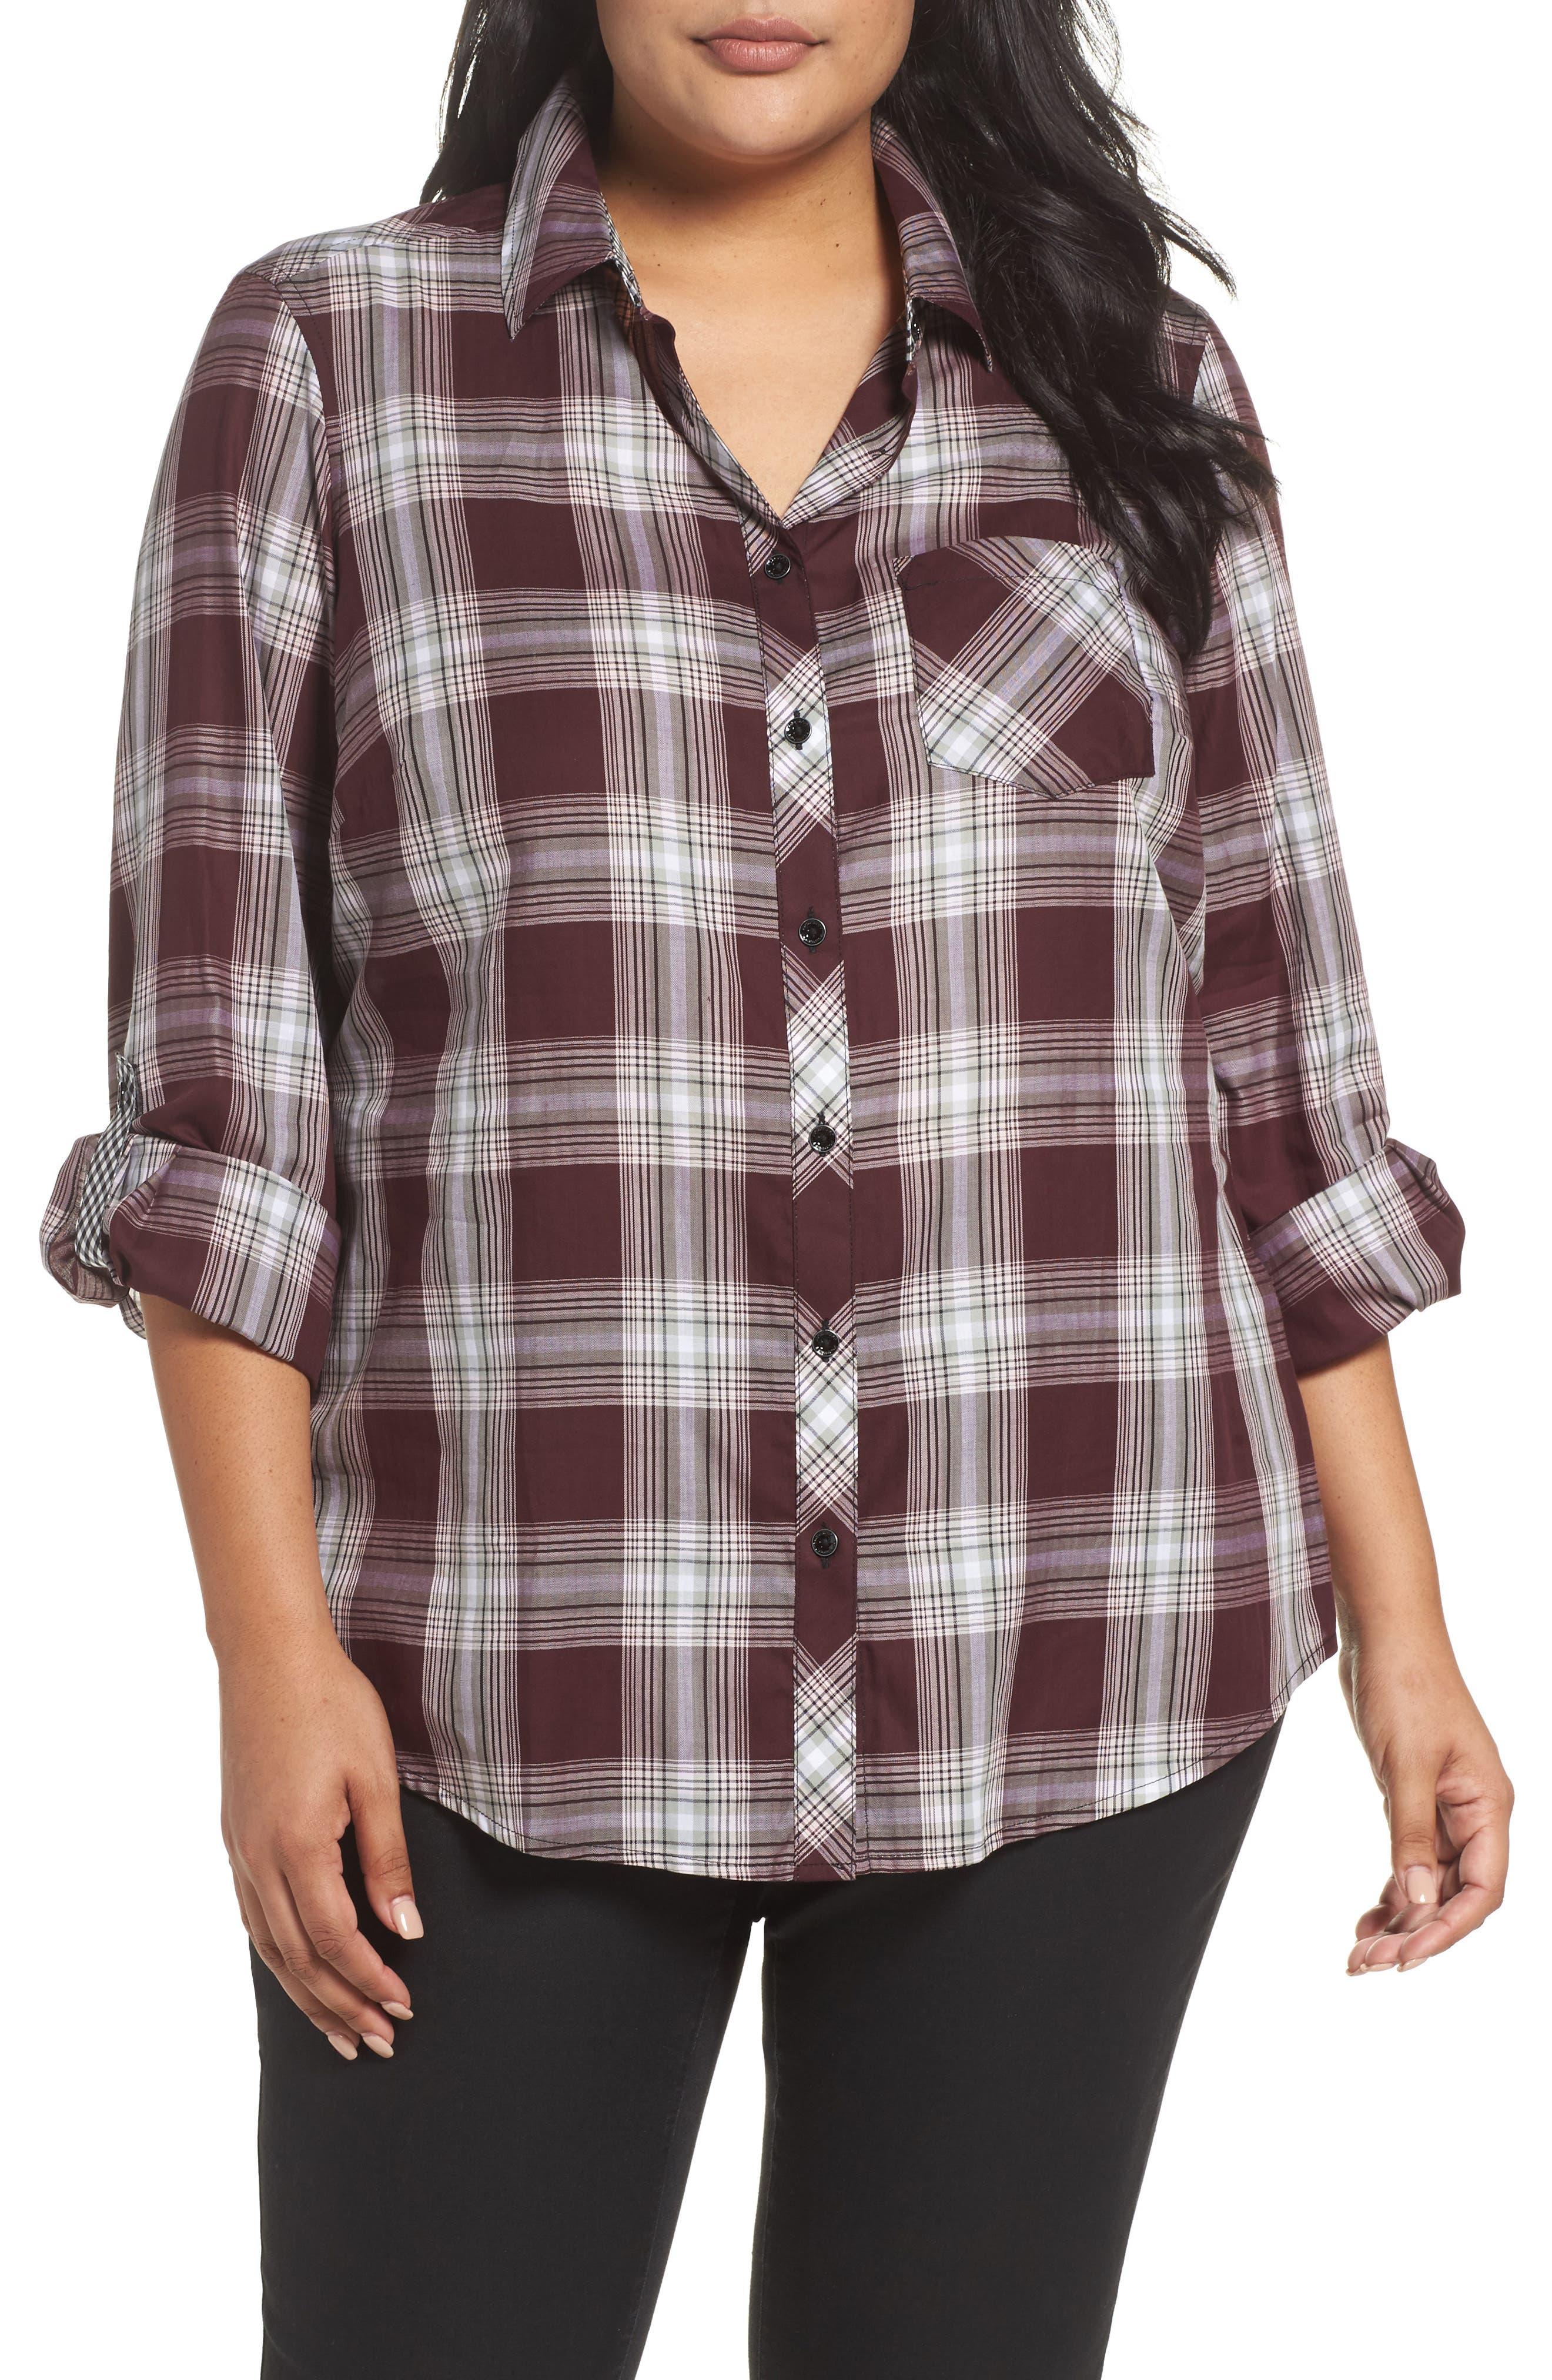 Main Image - Foxcroft Addison Plaid Cotton Shirt (Plus Size)